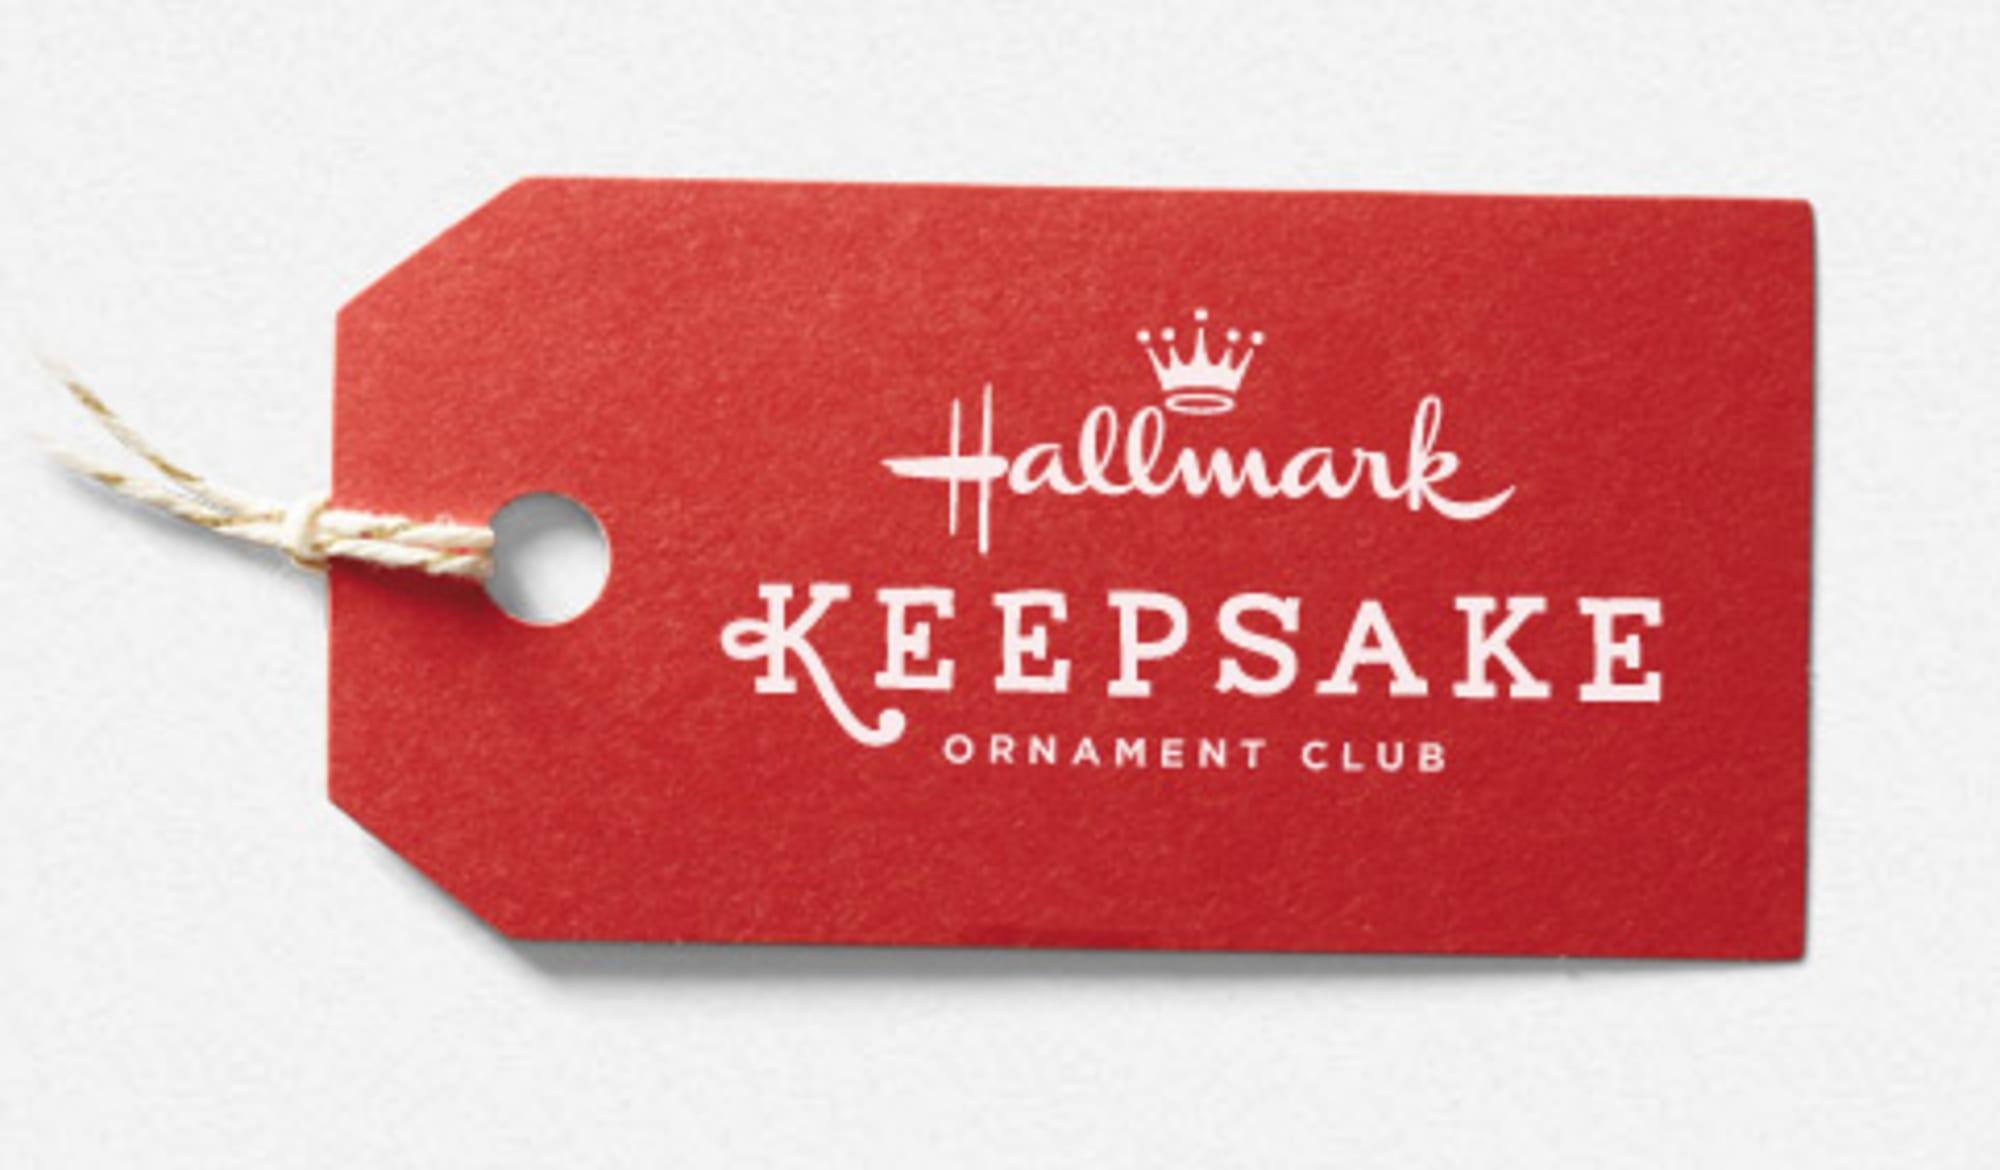 Hallmark Christmas Ornament TV Series The Walking Dead Rick Grimes 2016 NIB